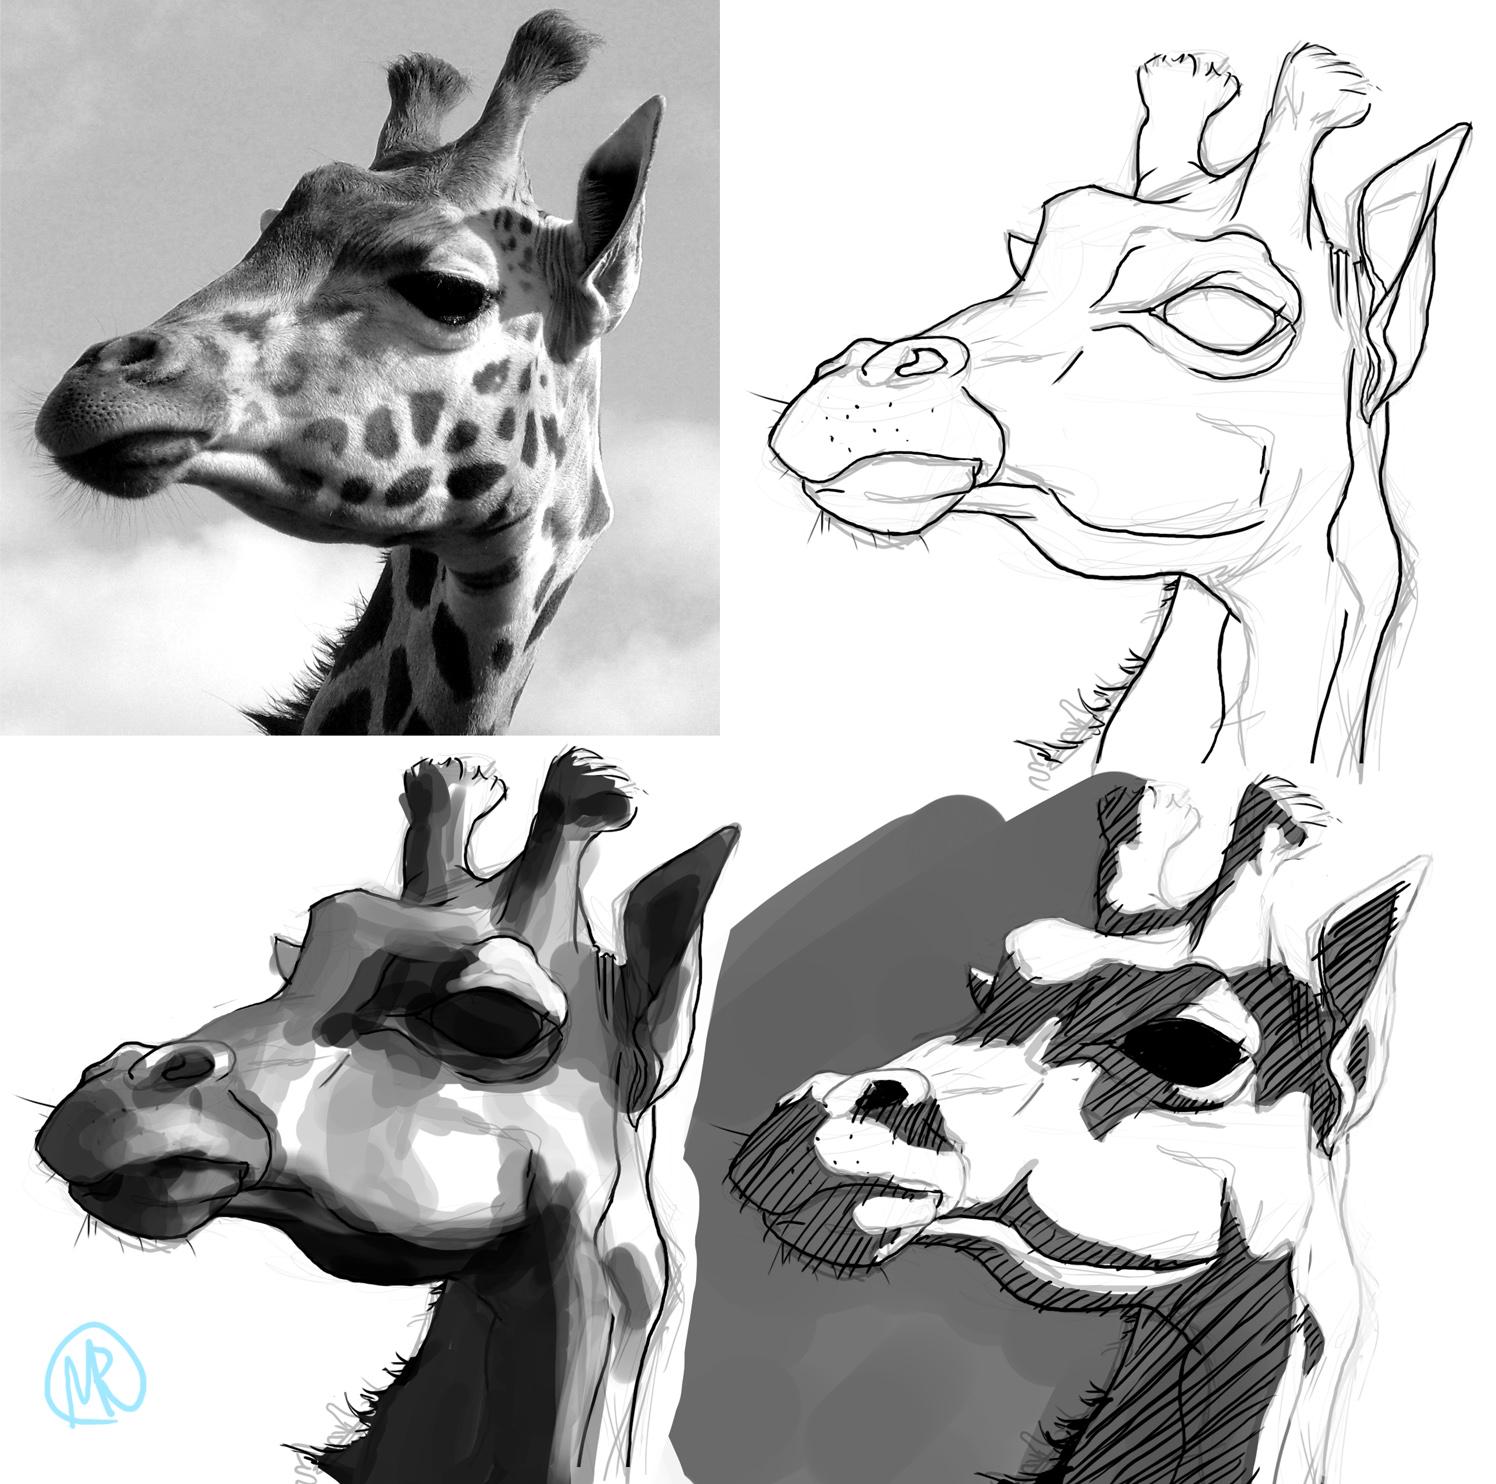 Giraffe Face Pencil Drawing - photo#9